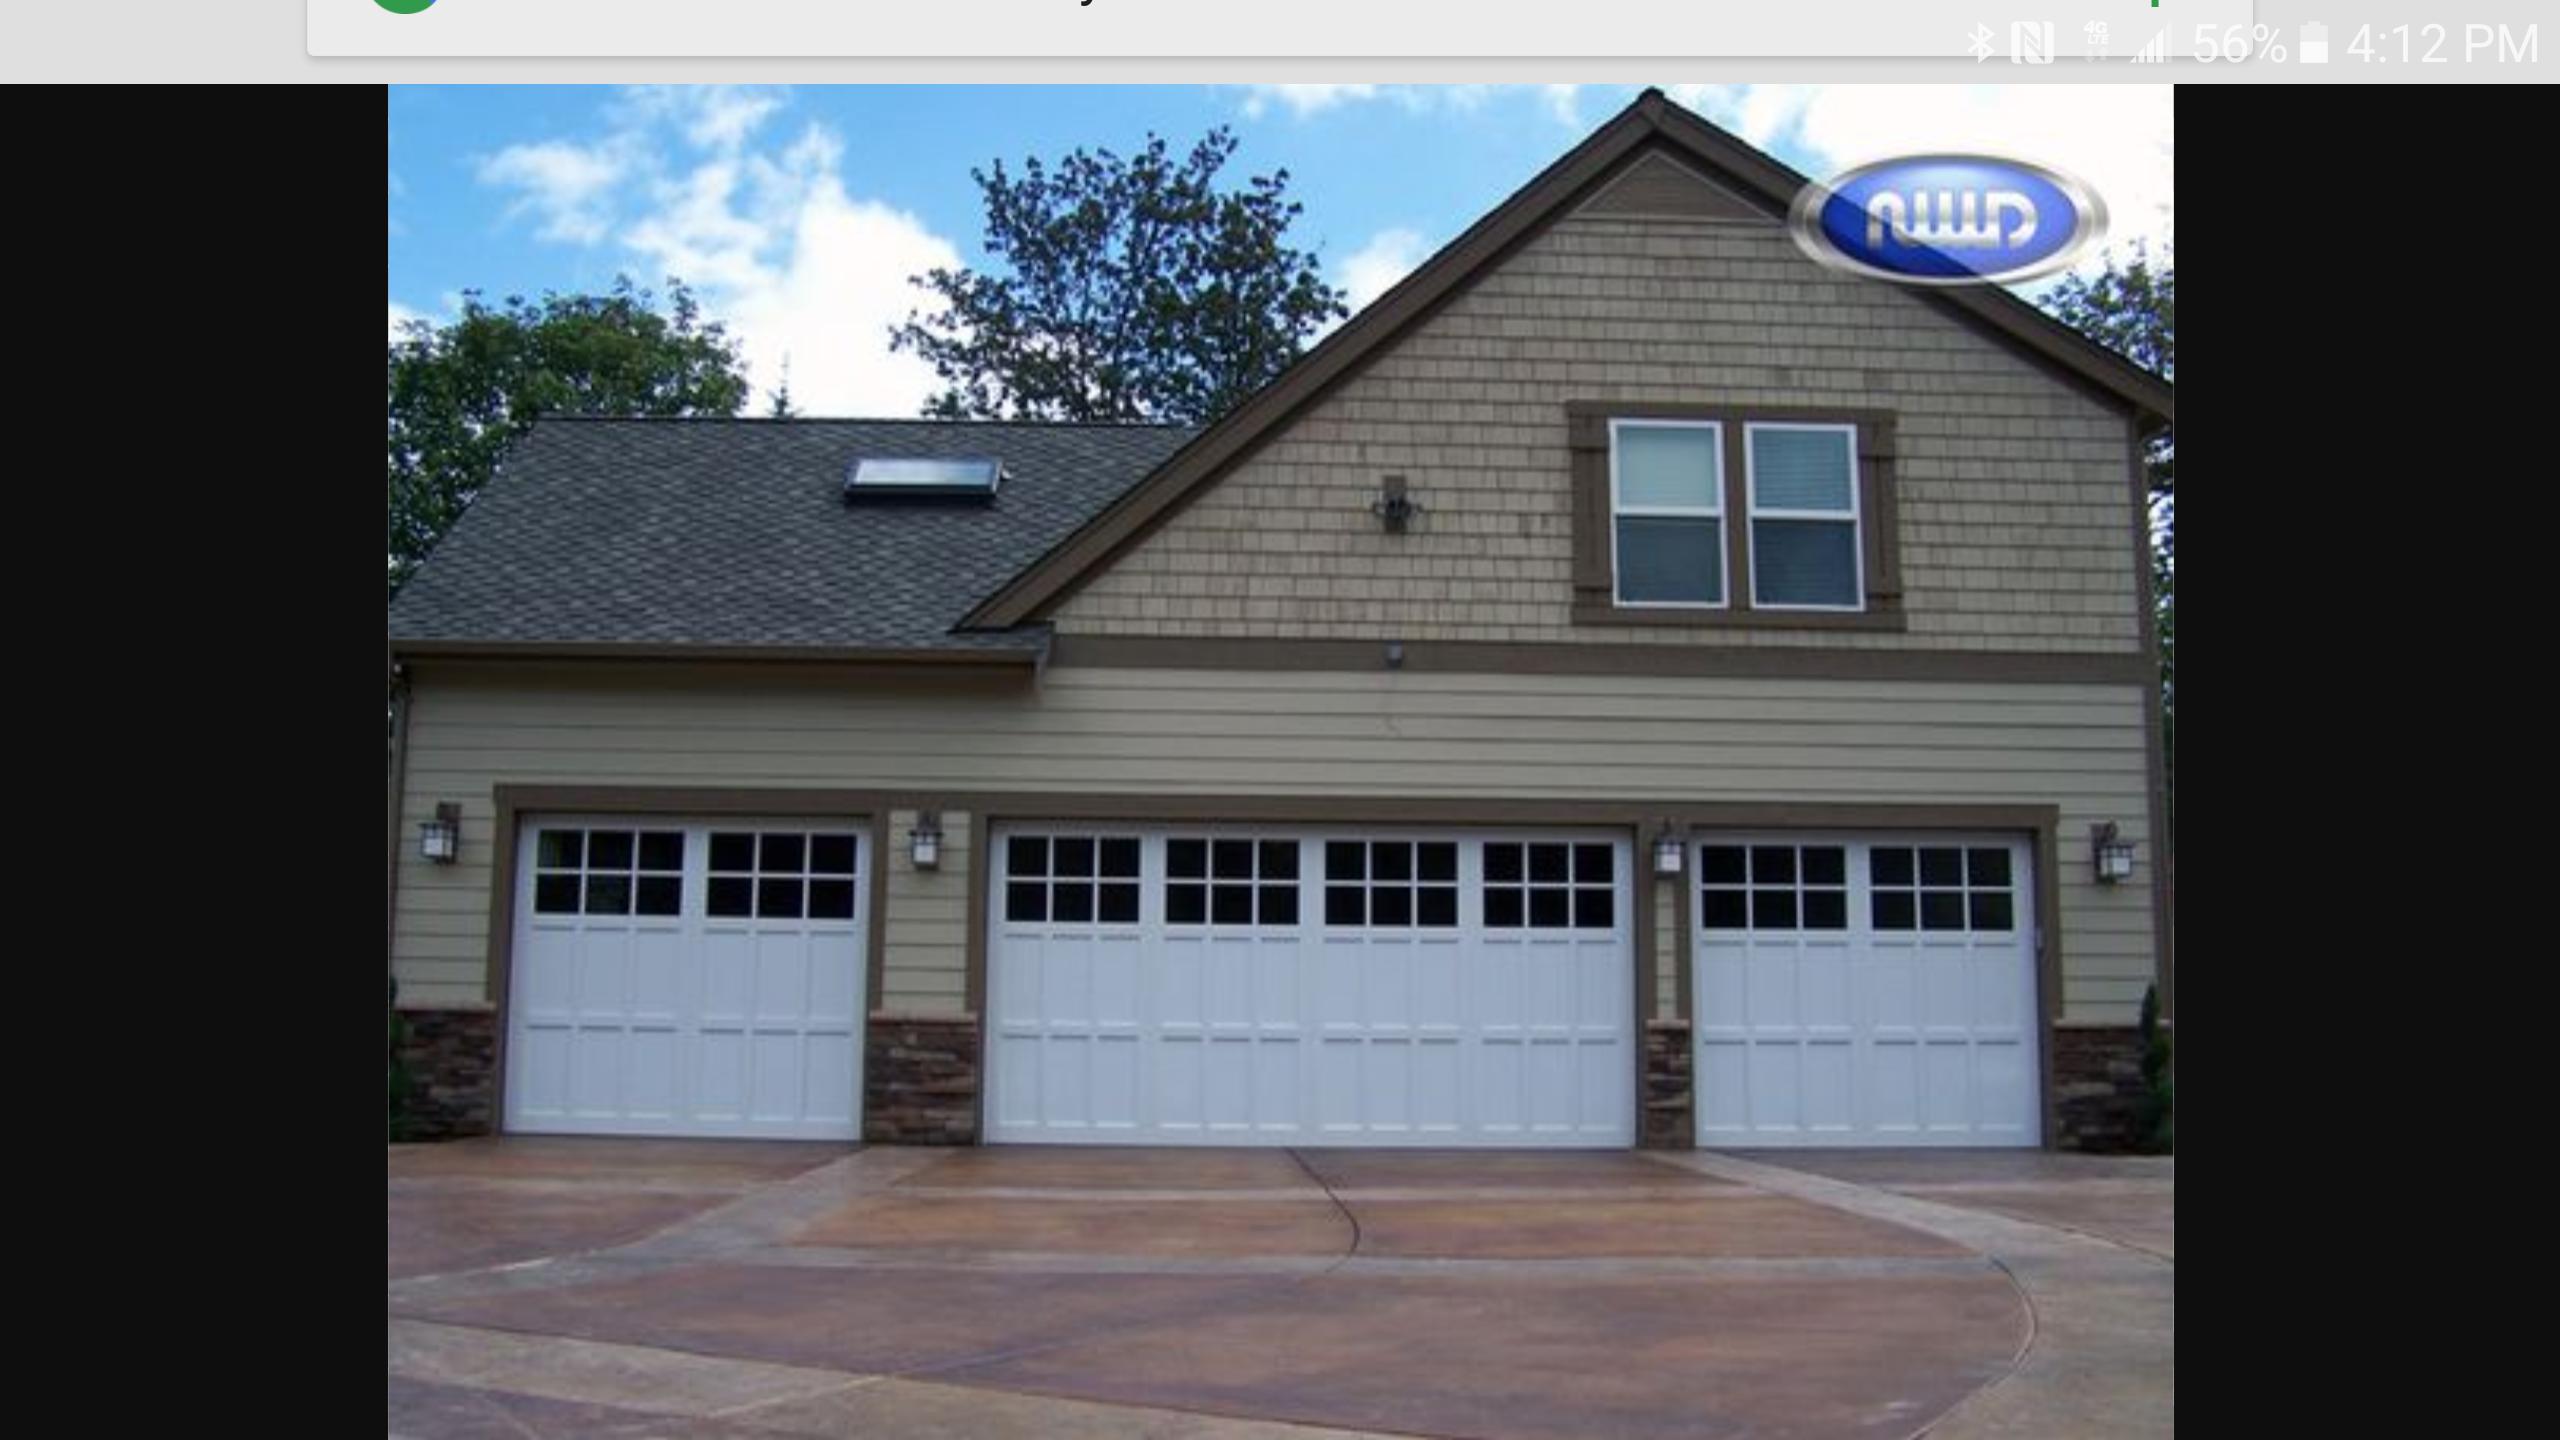 1440 #206EAB Complete Garage Door Services Fremont California Garage Door And  wallpaper Complete Garage Doors 36252560